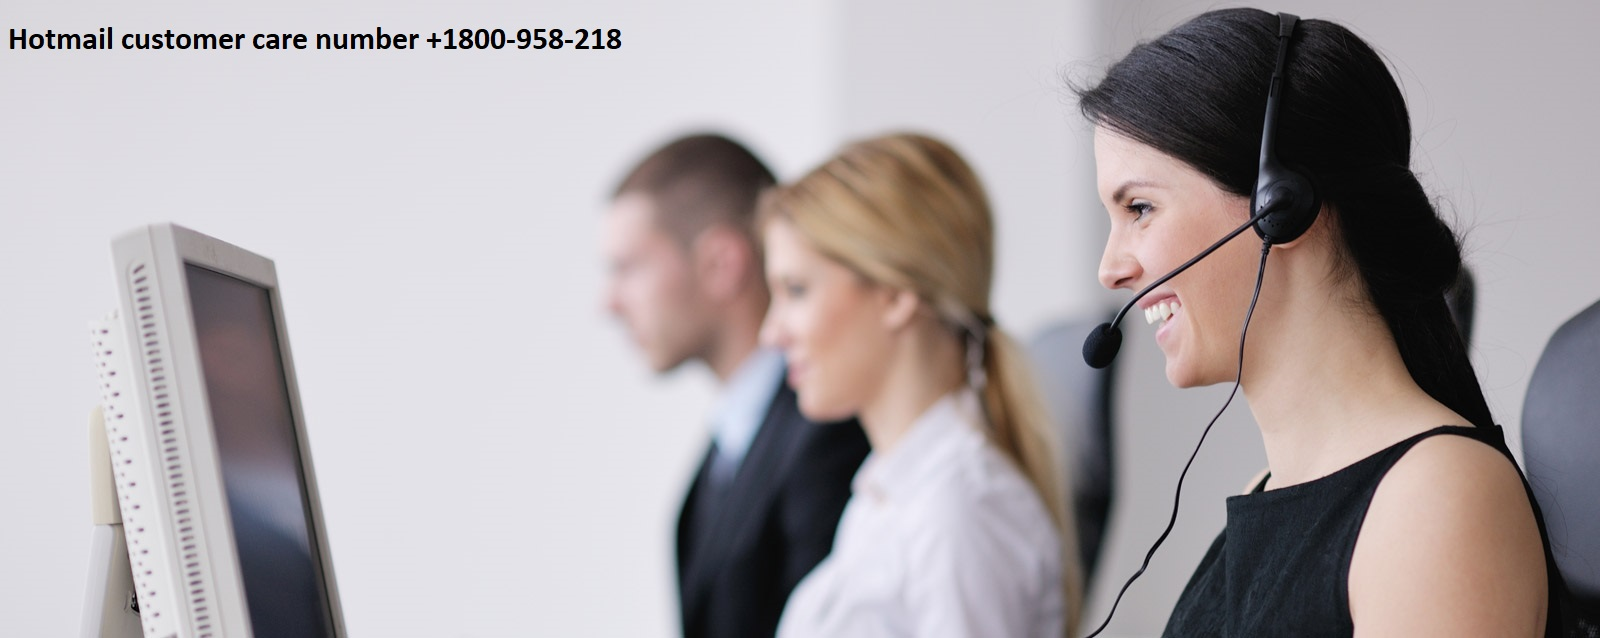 Microsoft office 365 service status